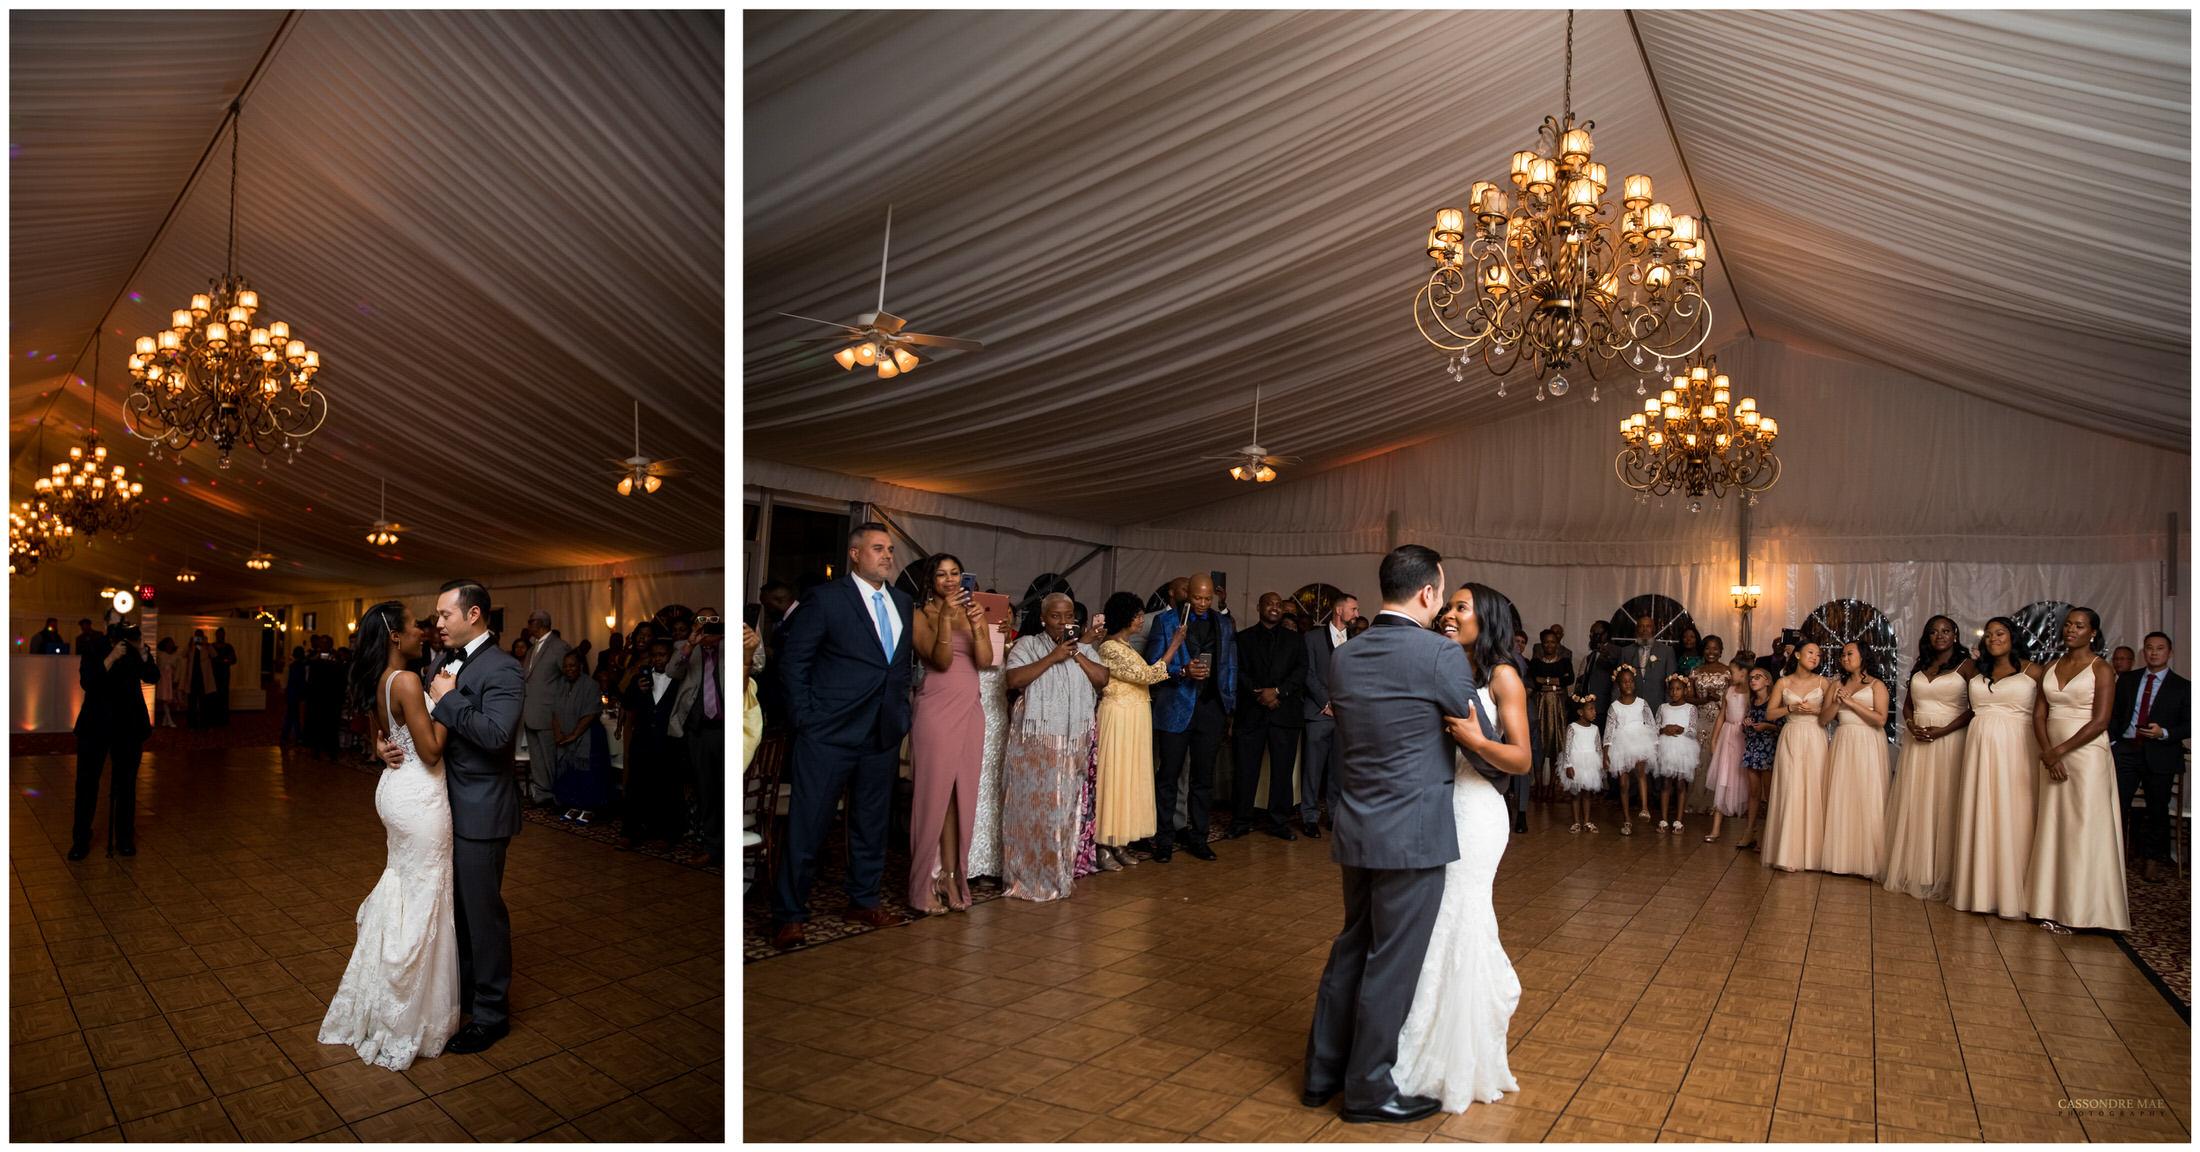 West Hills Country Club Wedding Photos Cassondre Mae Photography 23.jpg